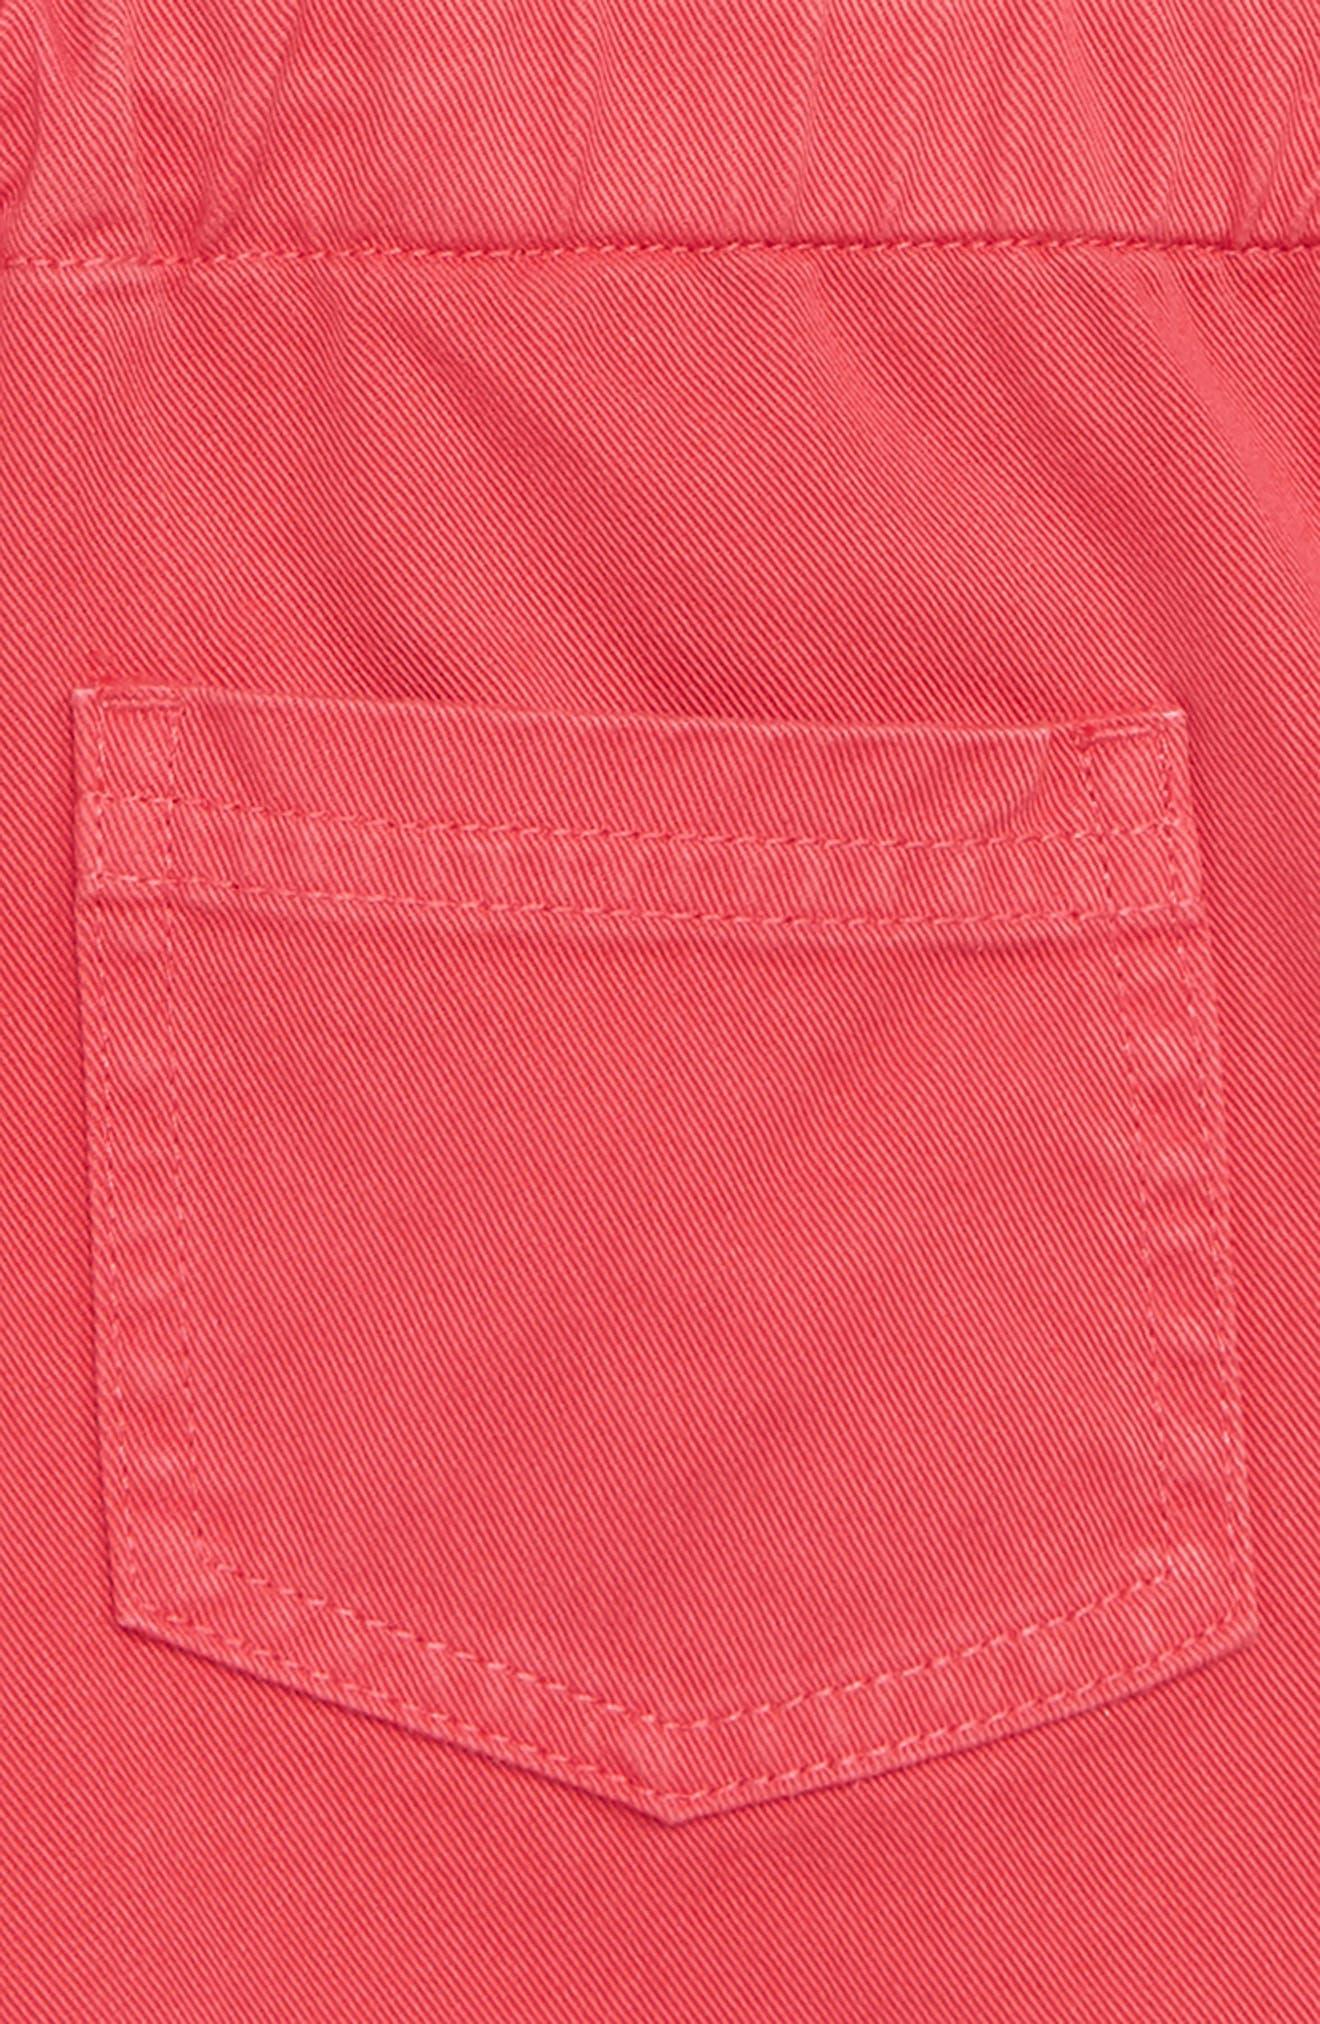 Frill Detail Shorts,                             Alternate thumbnail 3, color,                             Strawberry Split Pin